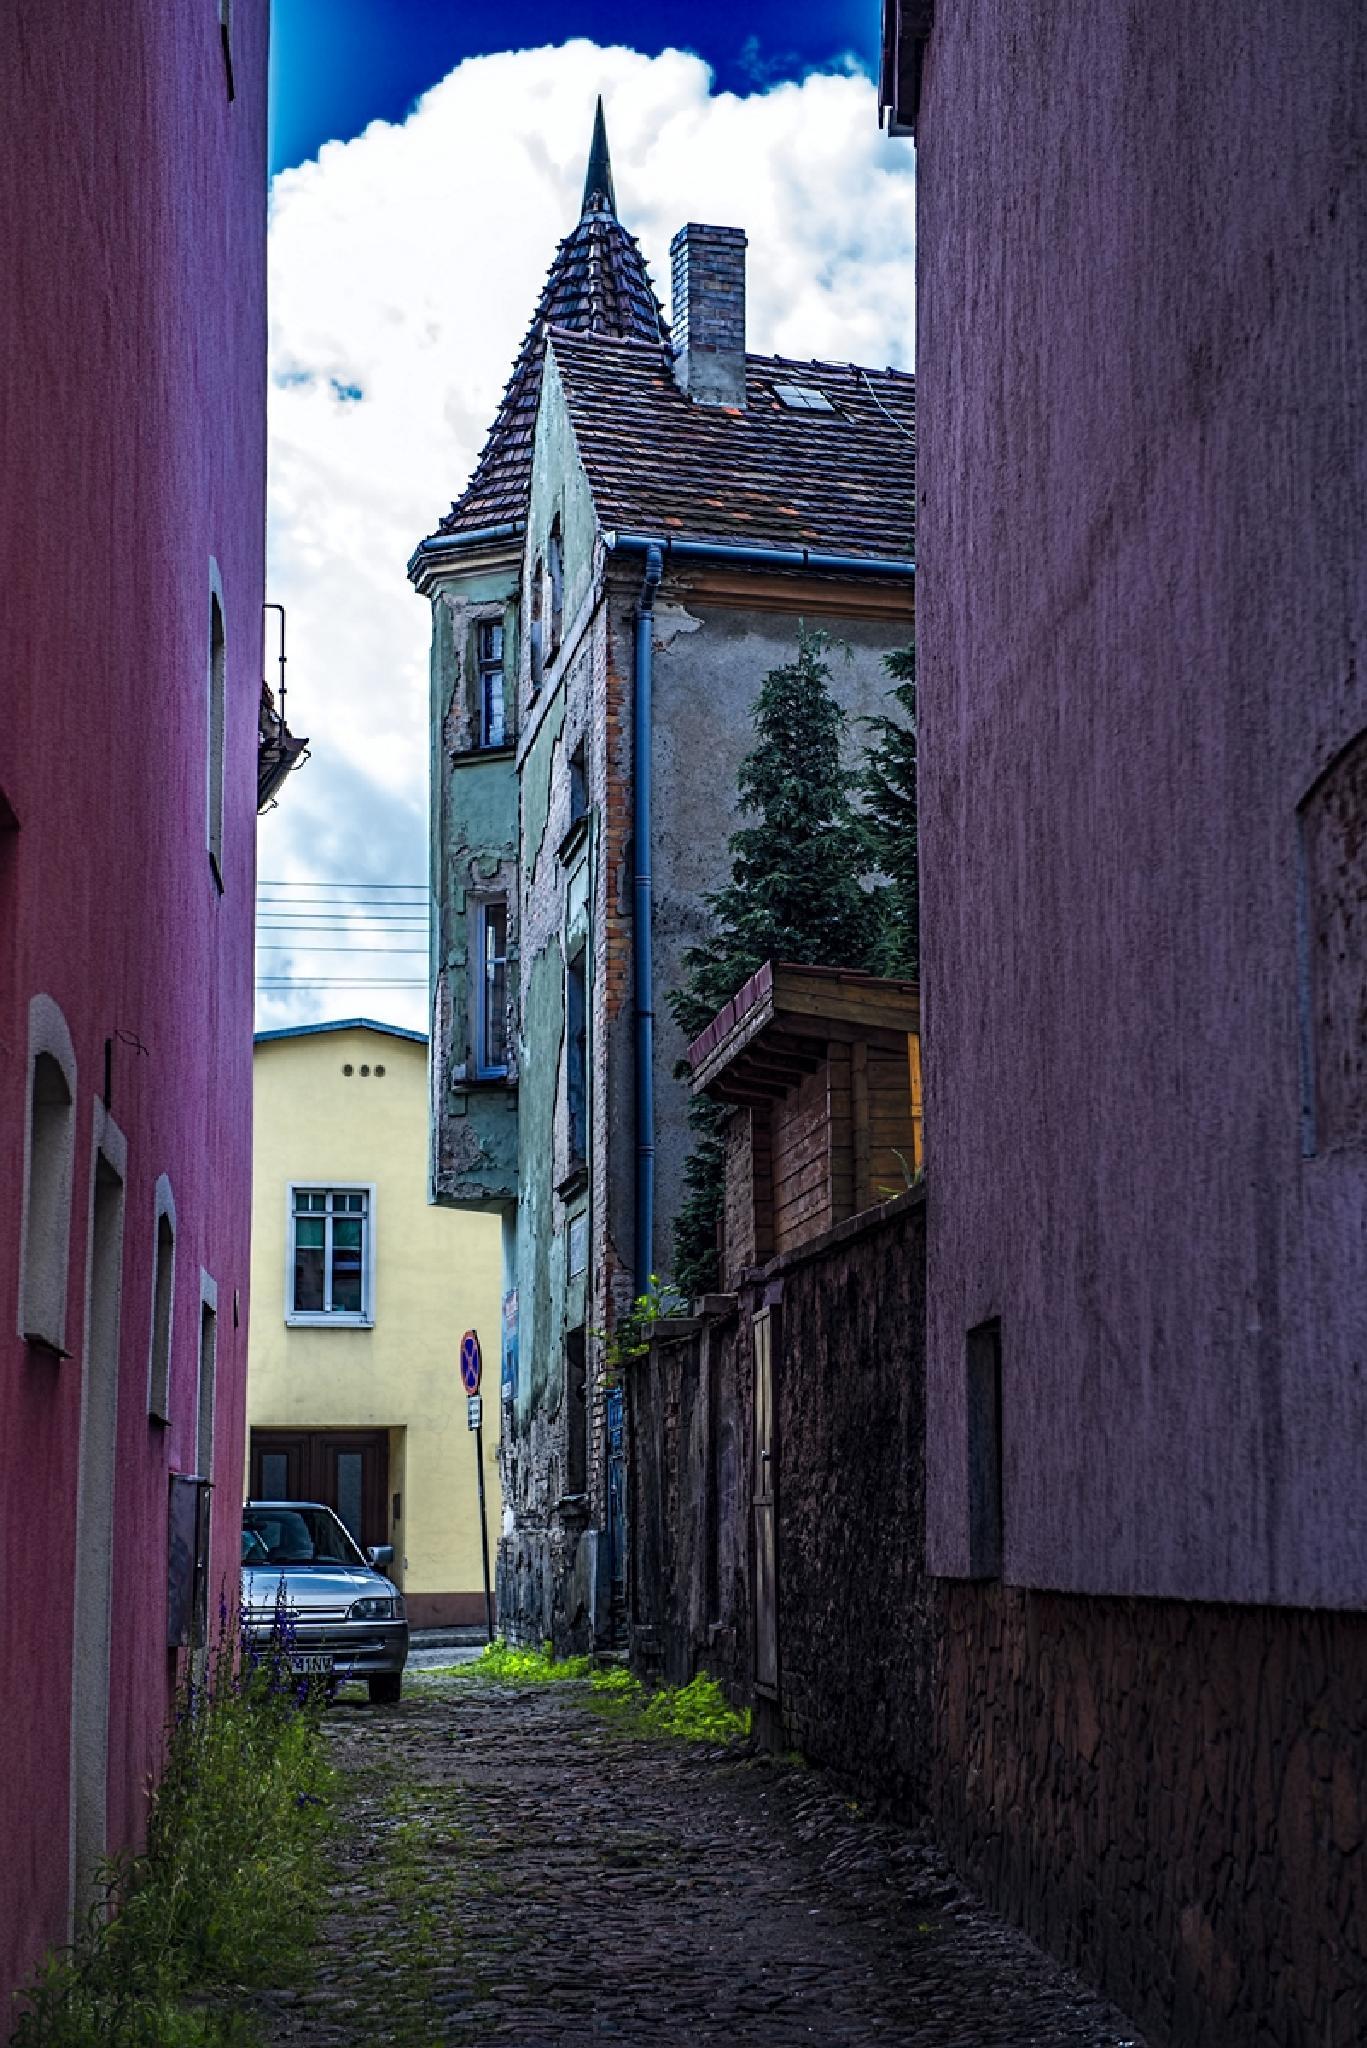 Pink alley by Waldemar Sadlowski